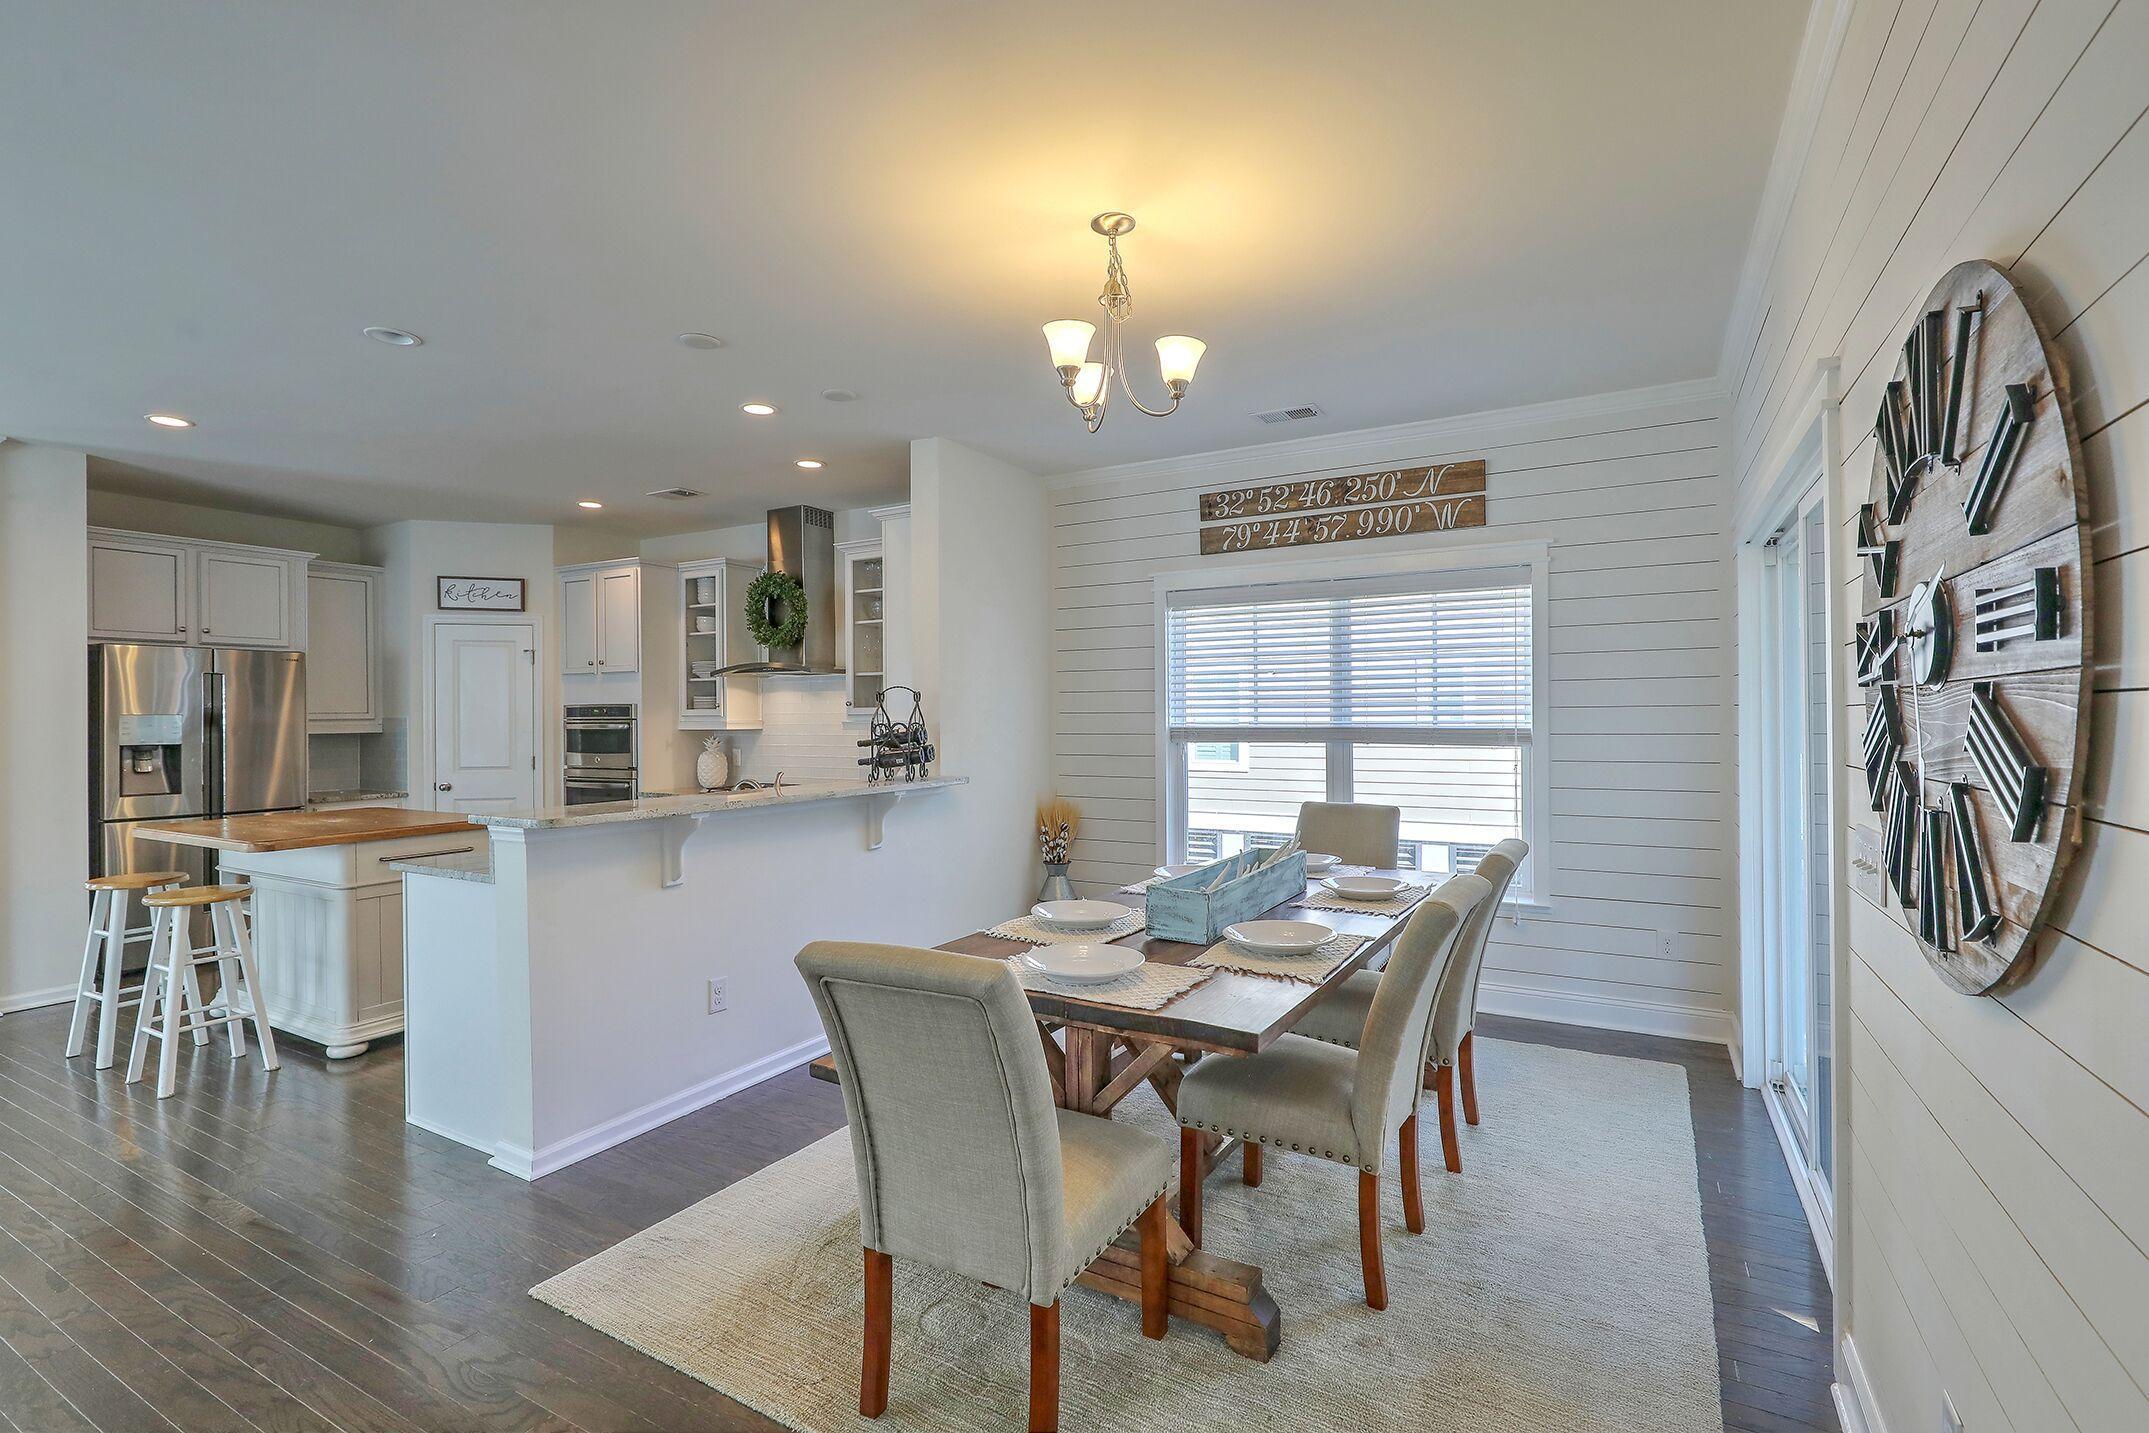 Copahee Landing Homes For Sale - 3731 Copahee Sound, Mount Pleasant, SC - 28